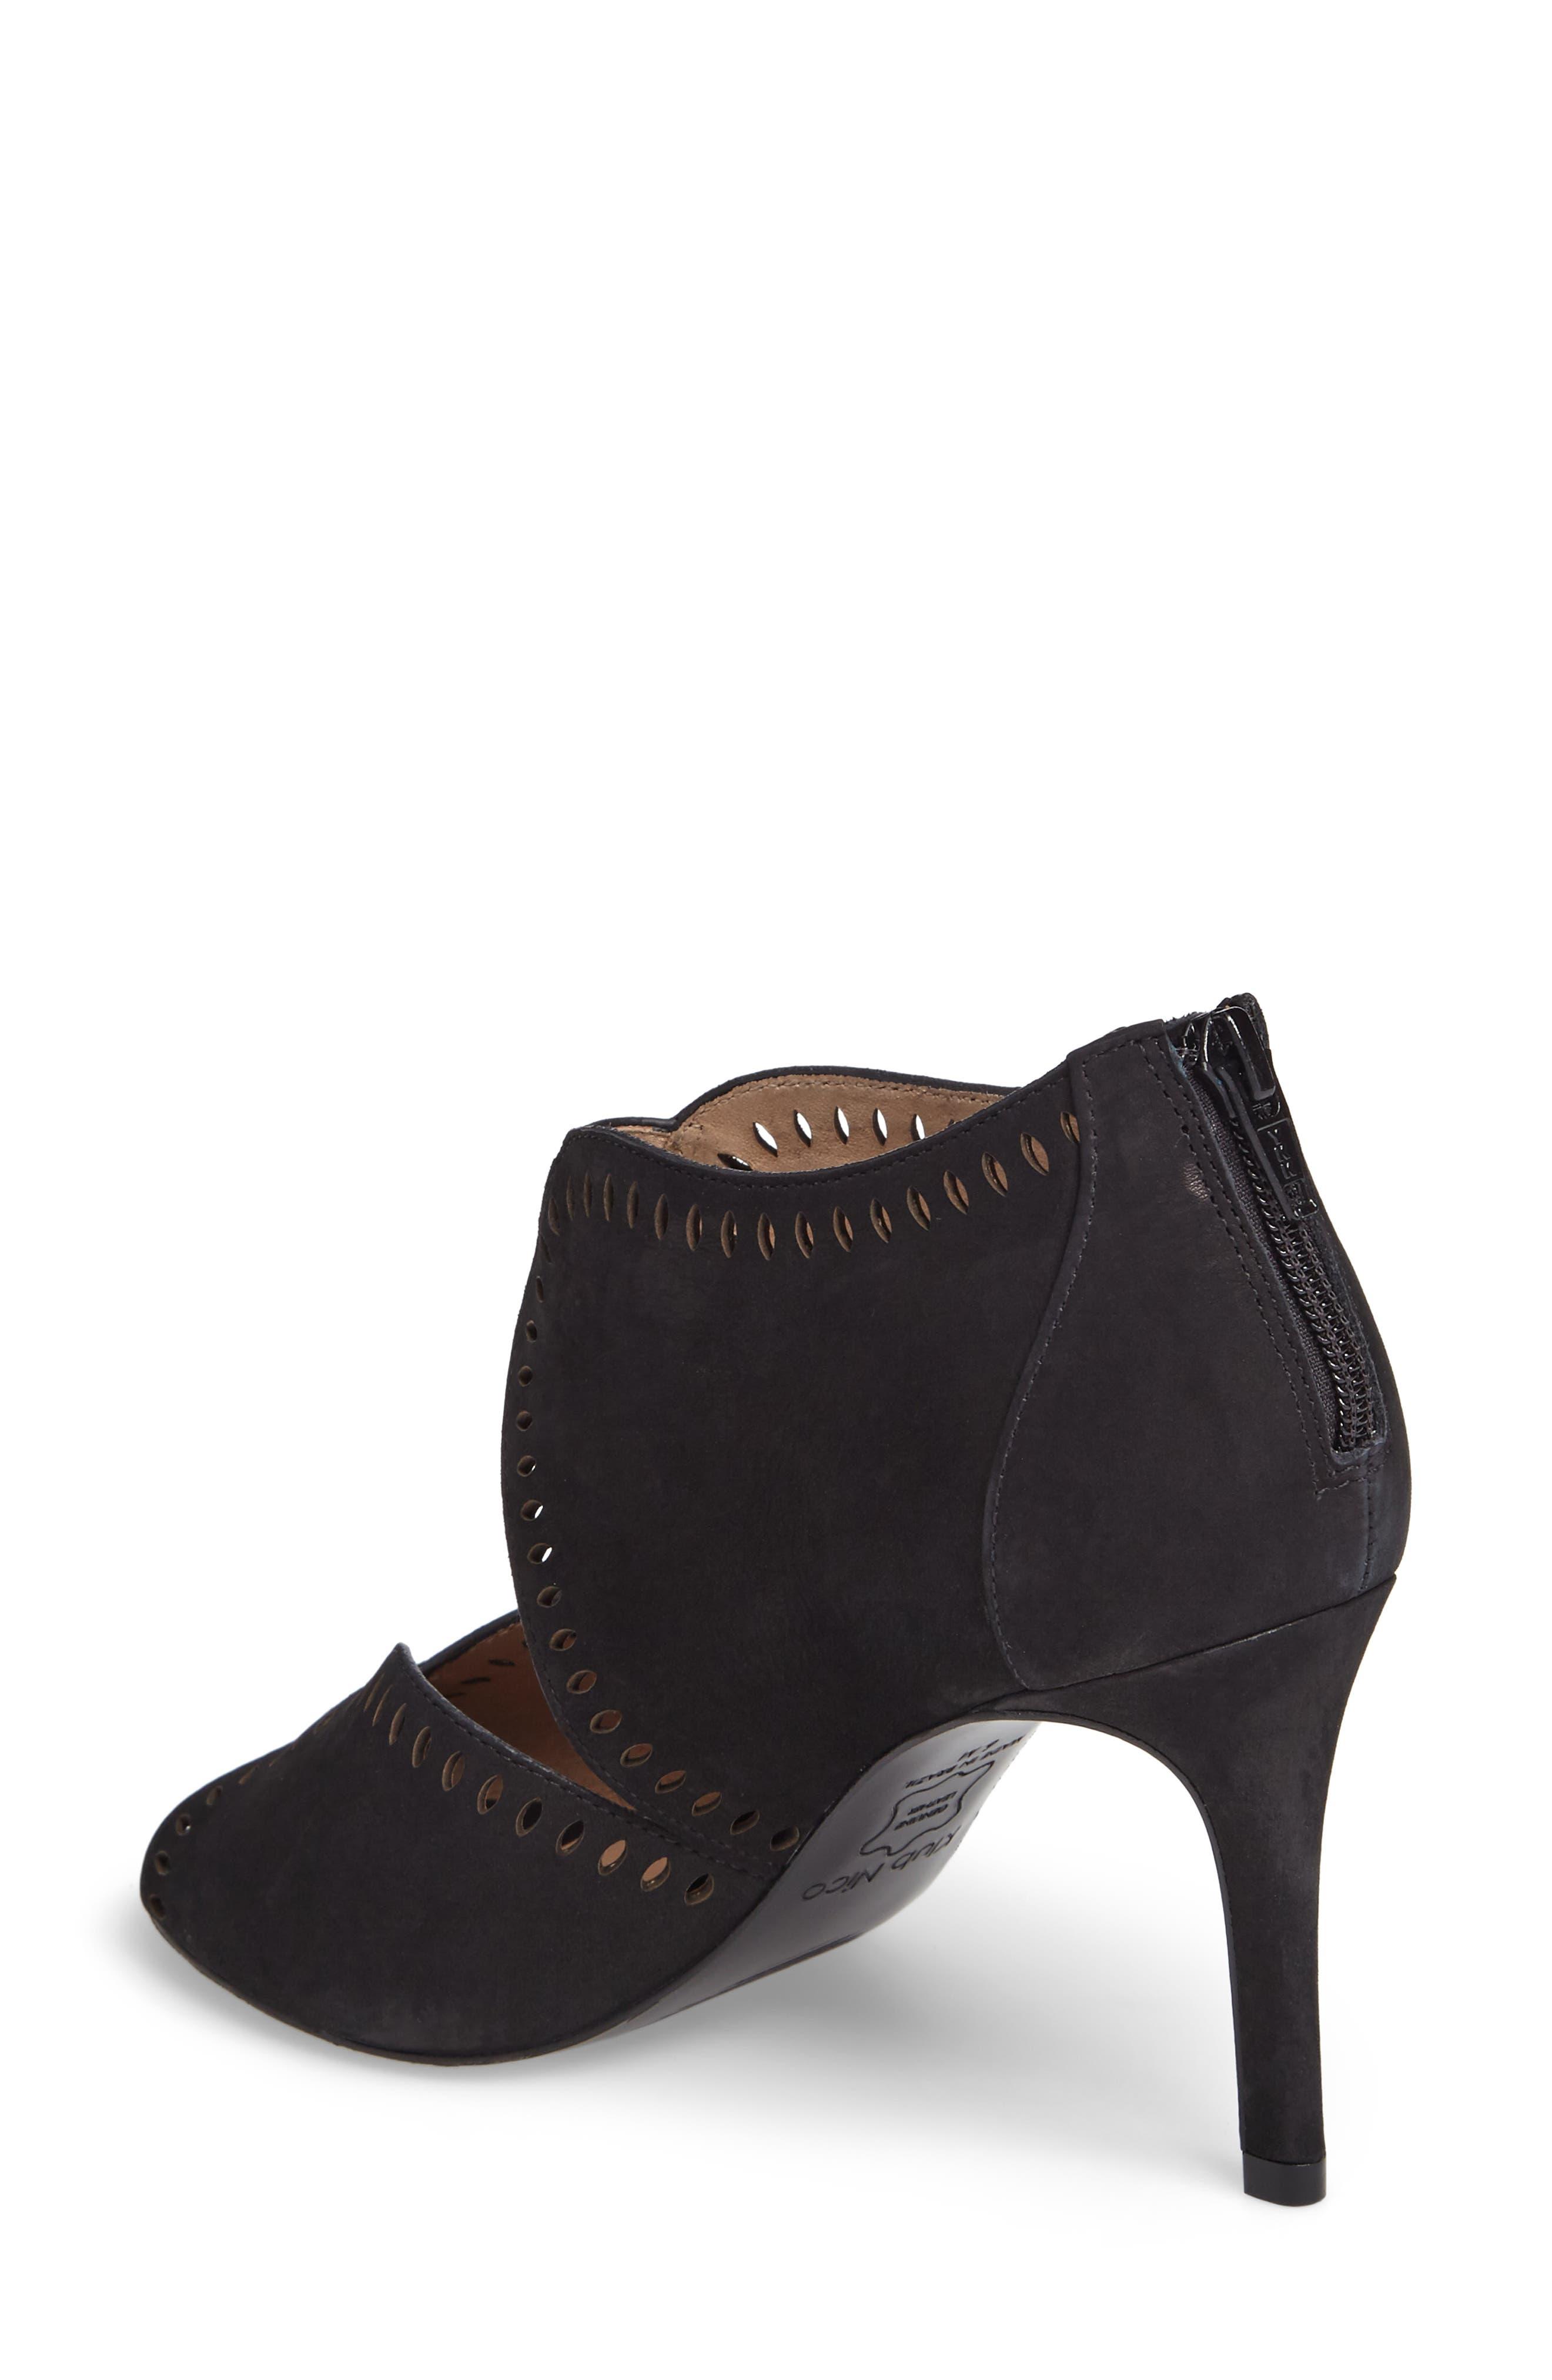 Mallia Perforated Sandal,                             Alternate thumbnail 2, color,                             001